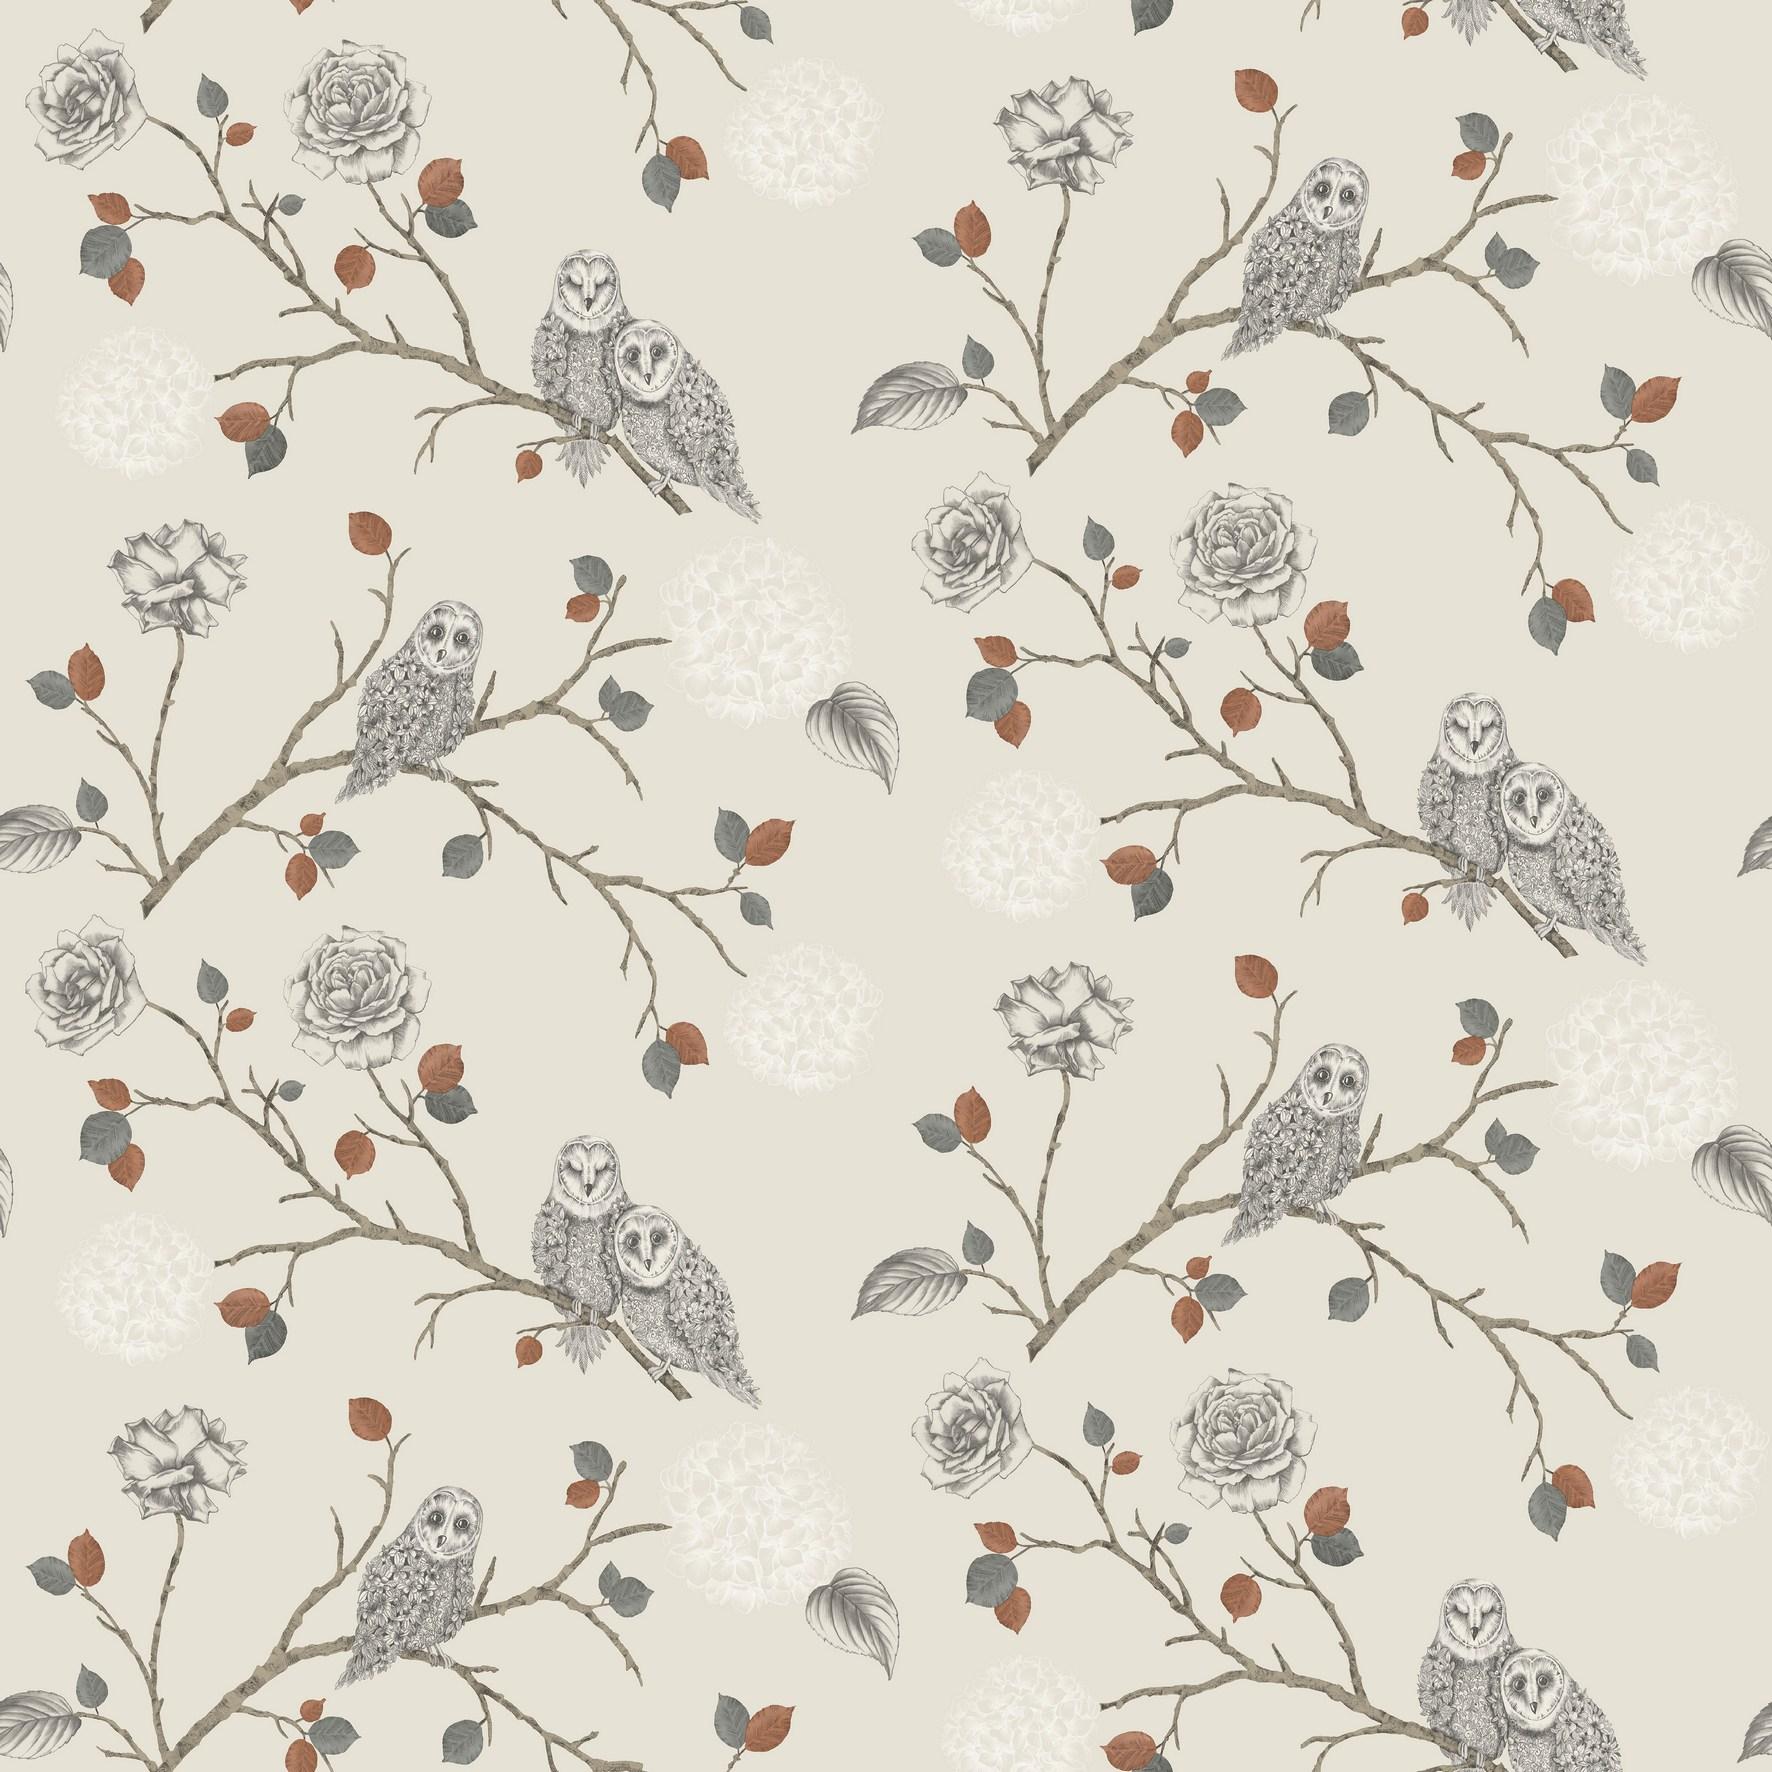 Shop Enchantment Range Night Owl Night Owl Copper Wallpaper 1772x1772